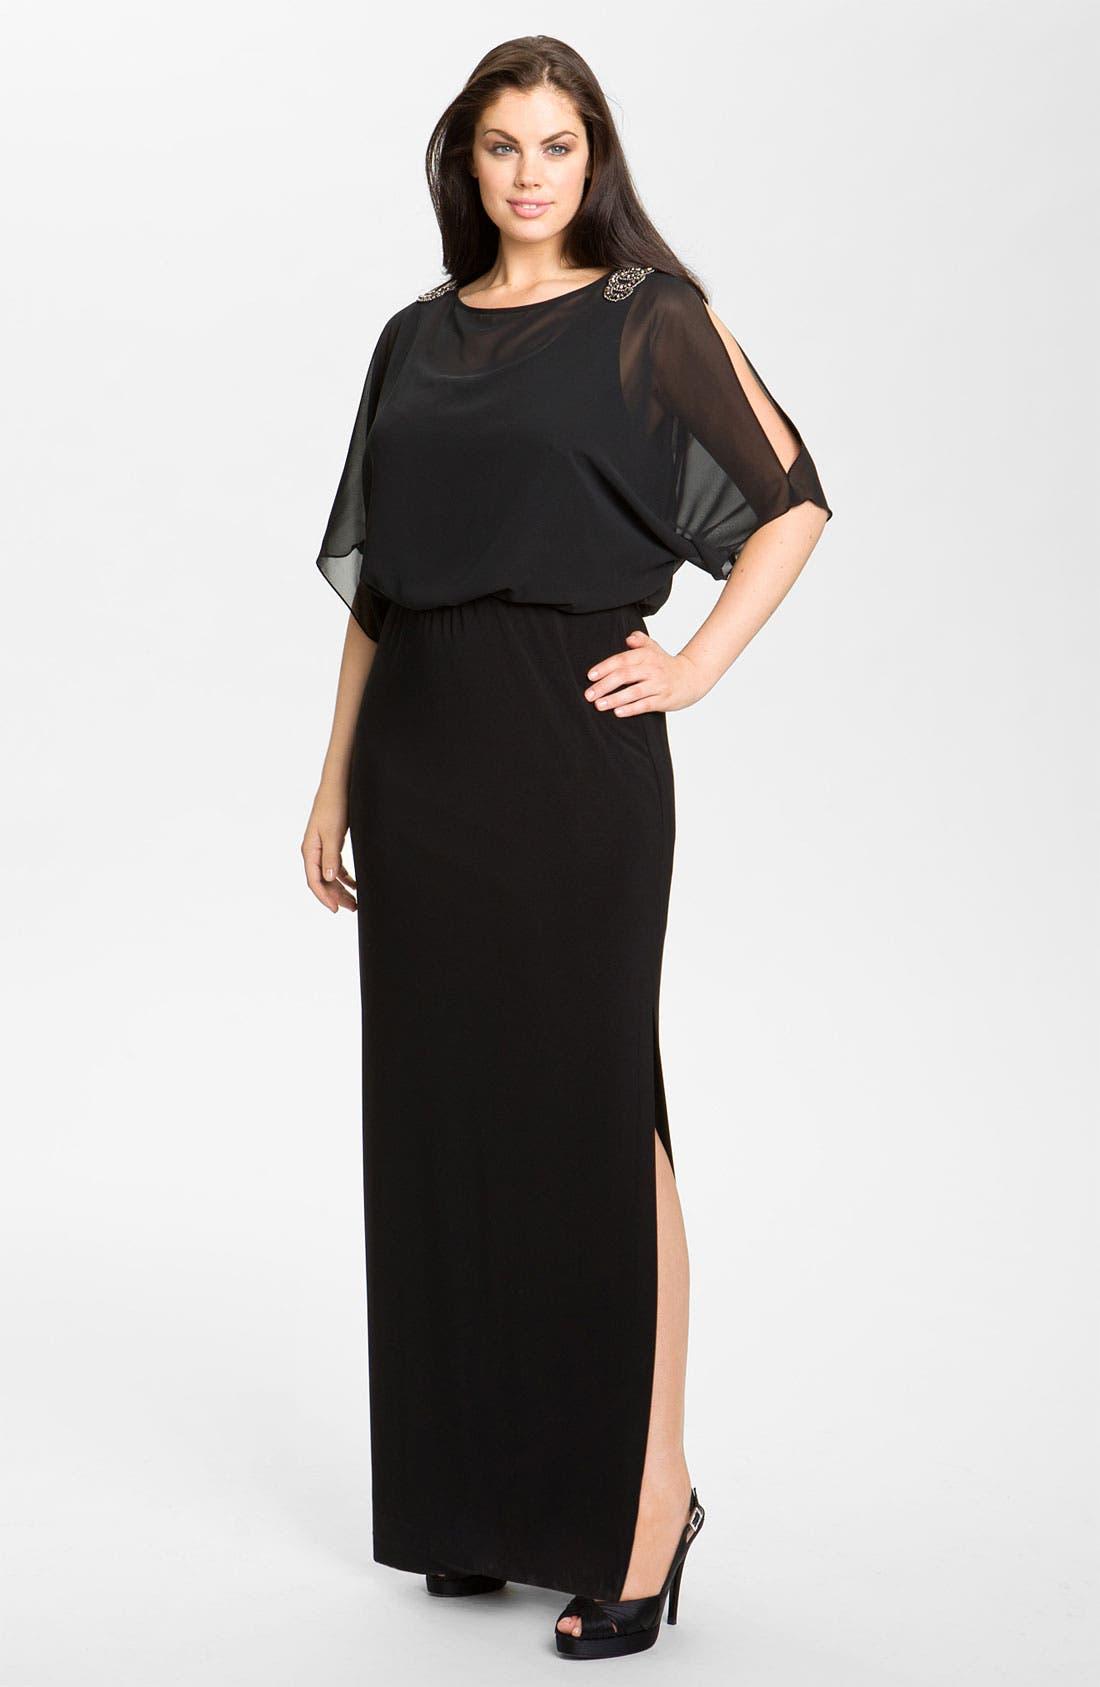 Alternate Image 1 Selected - Xscape Embellished Blouson Bodice Jersey Dress (Plus Size)